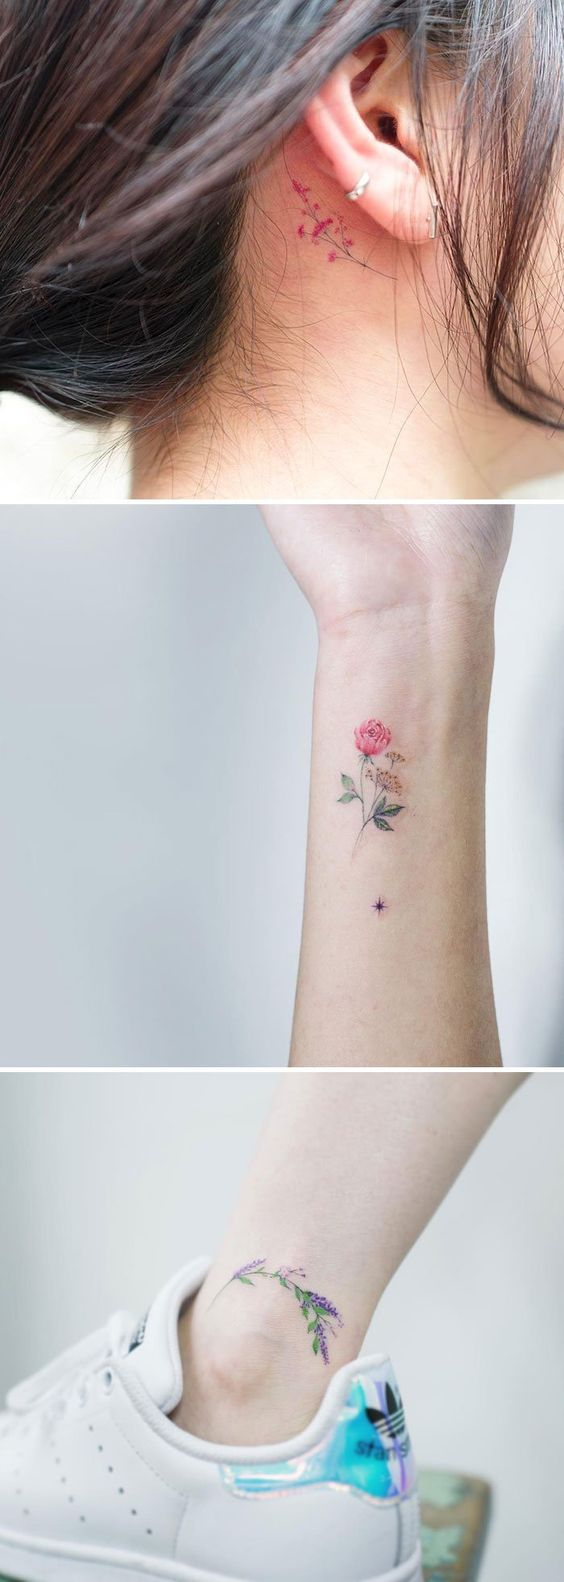 tatuaje flor5 - Pequeños Y Hermosos Tatuajes De Flores Para Mujer